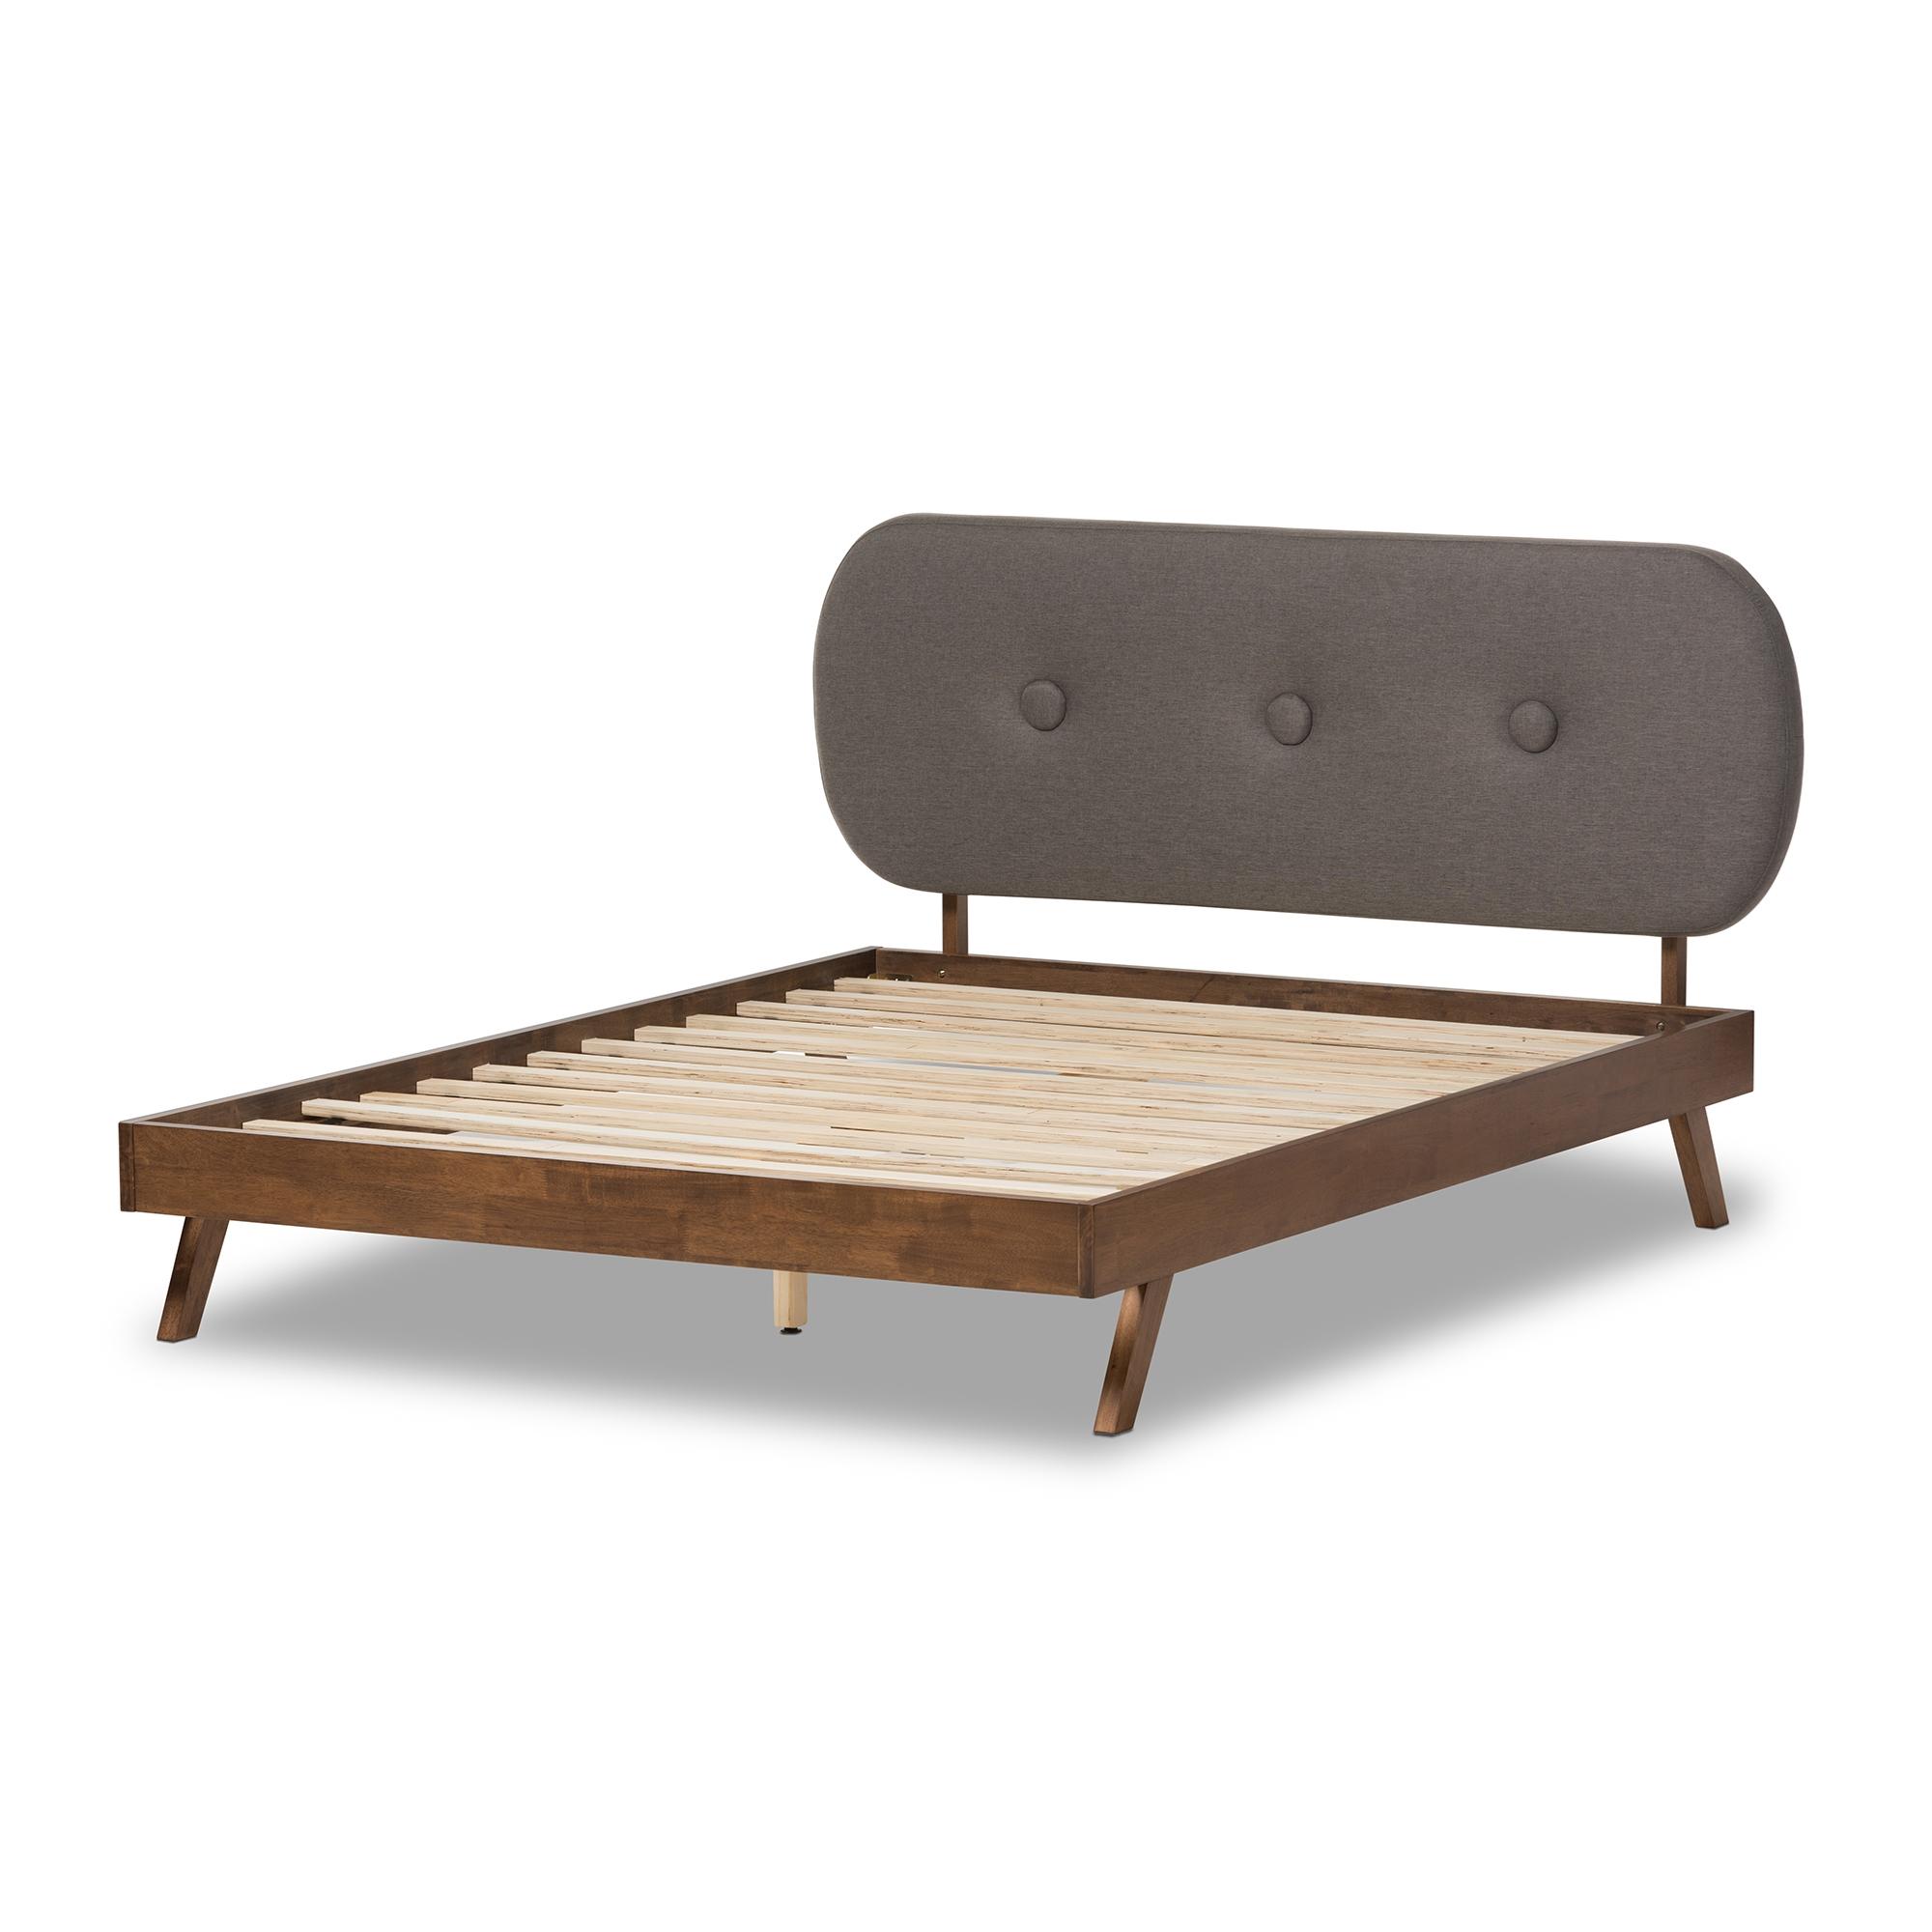 baxton studio penelope midcentury modern solid walnut wood grey fabric upholstered full size platform